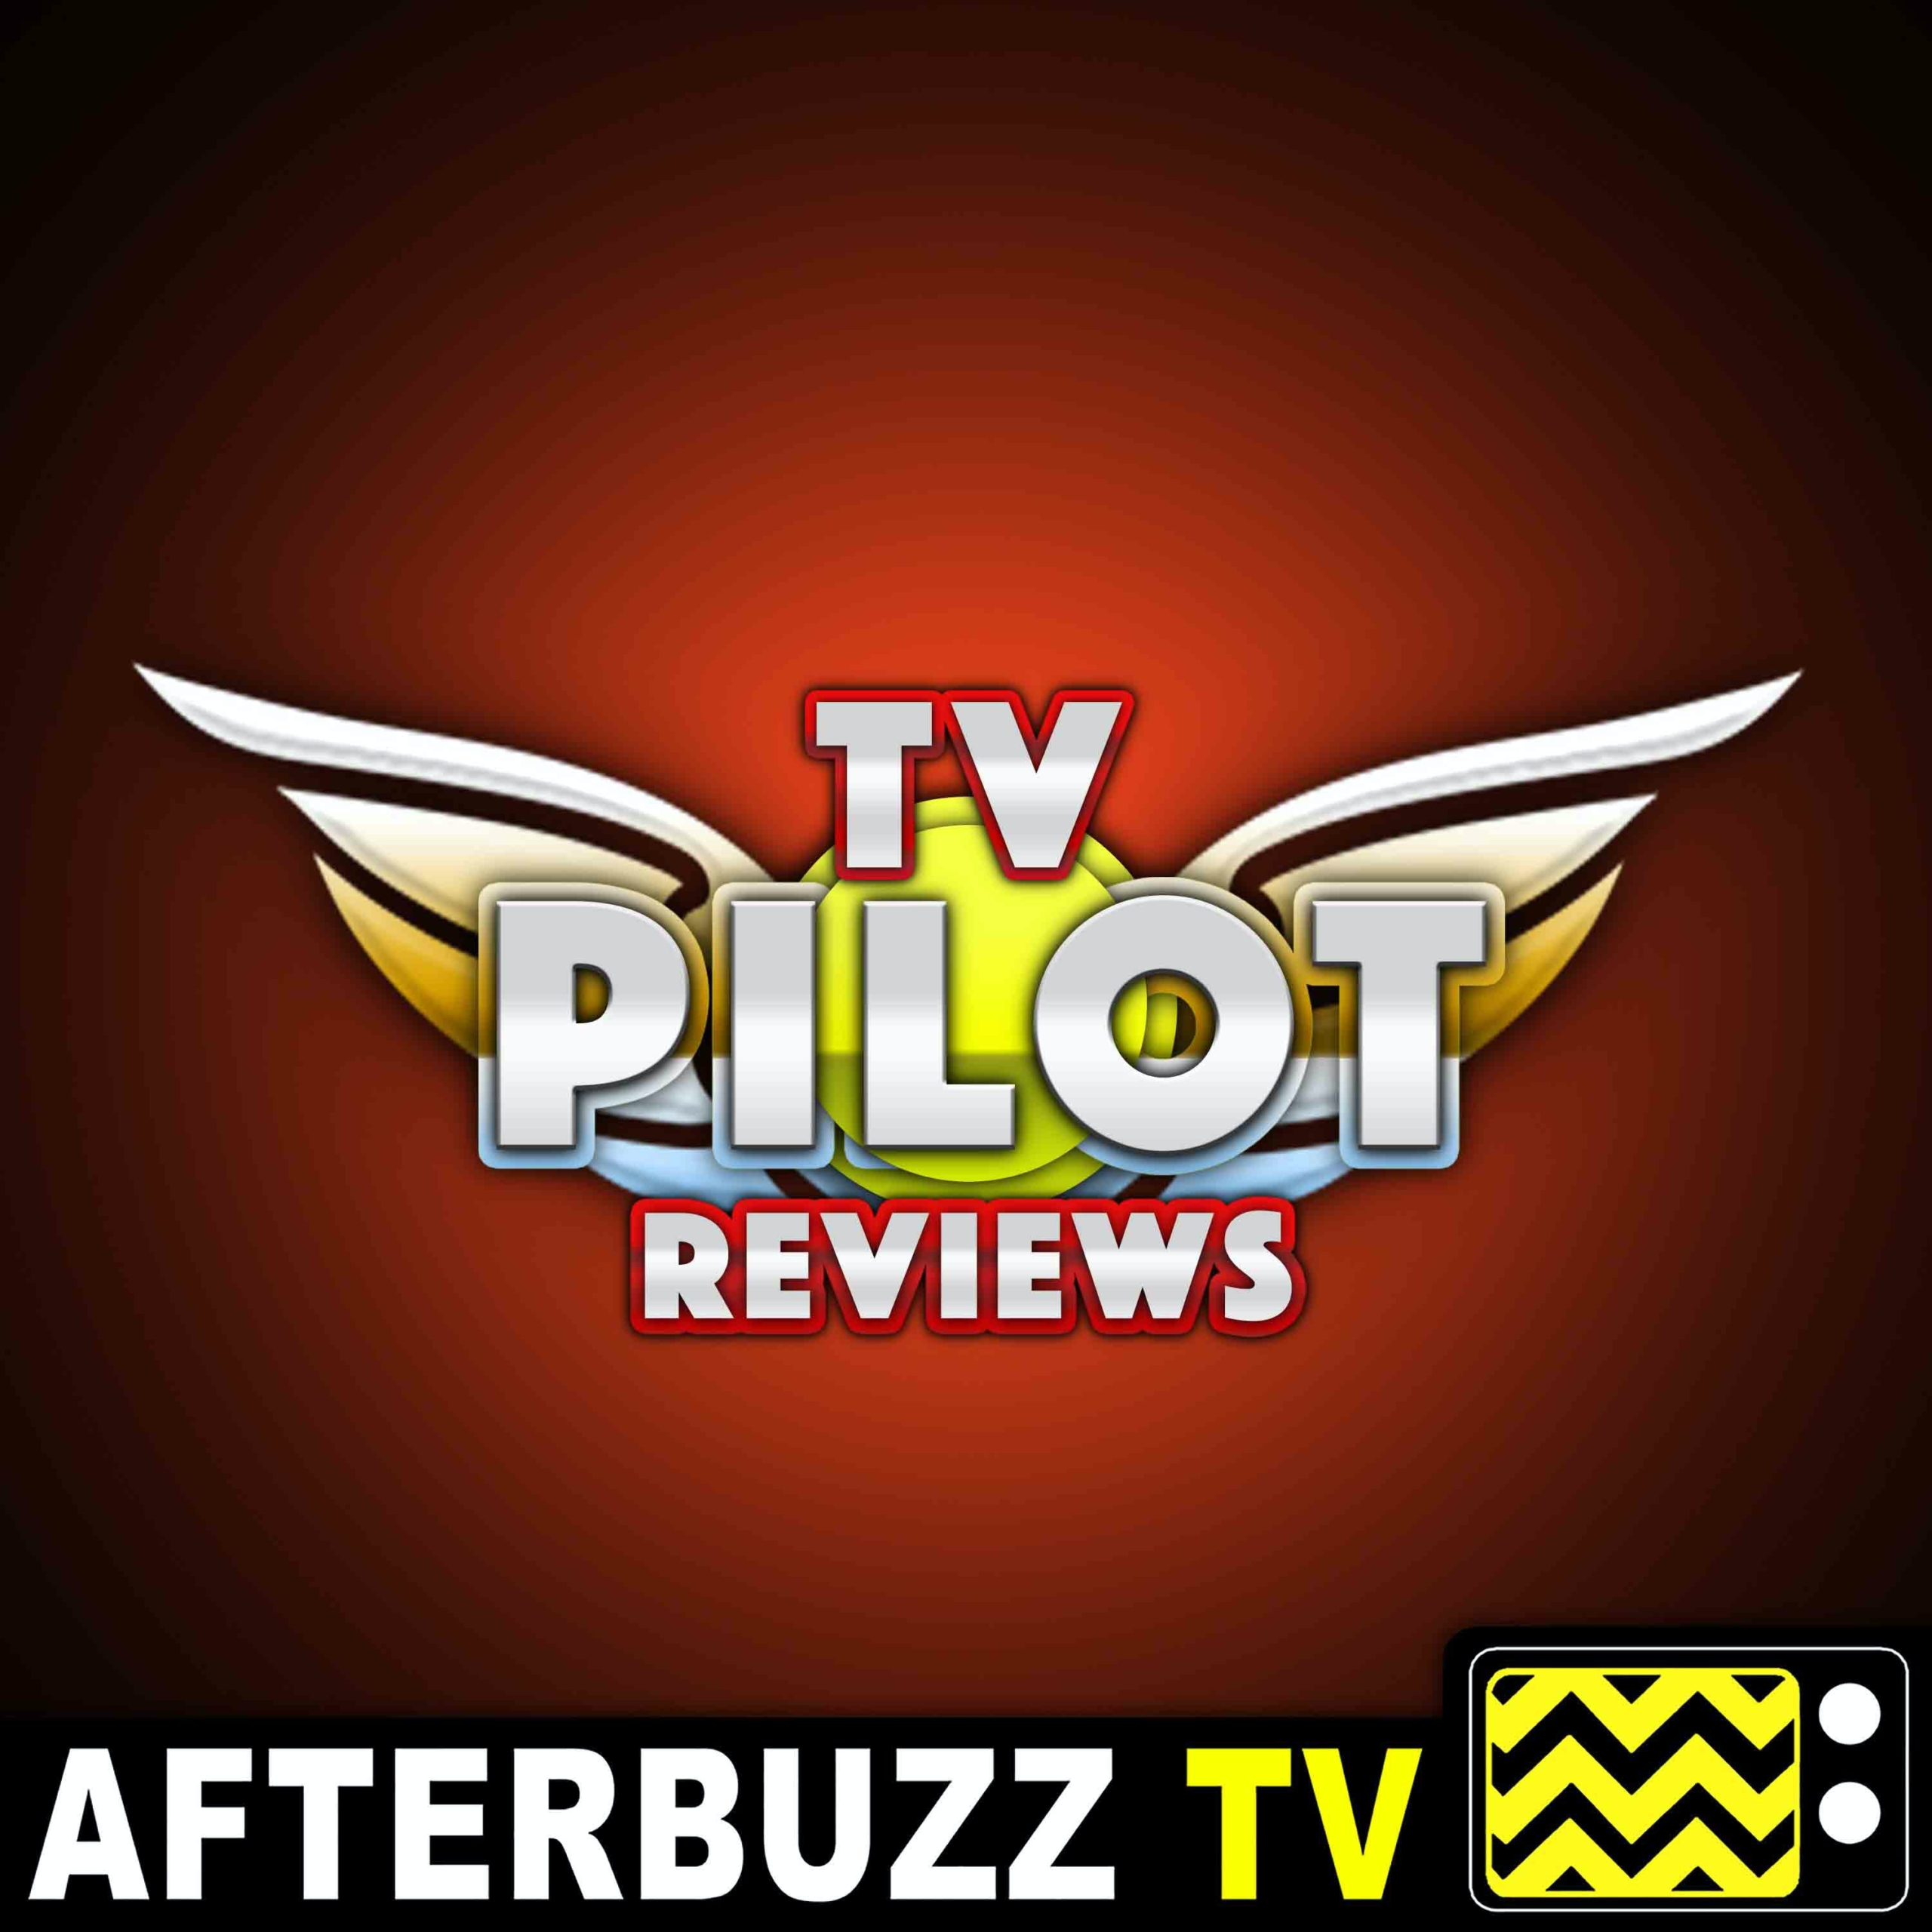 TV Pilot Reviews - AfterBuzz TV